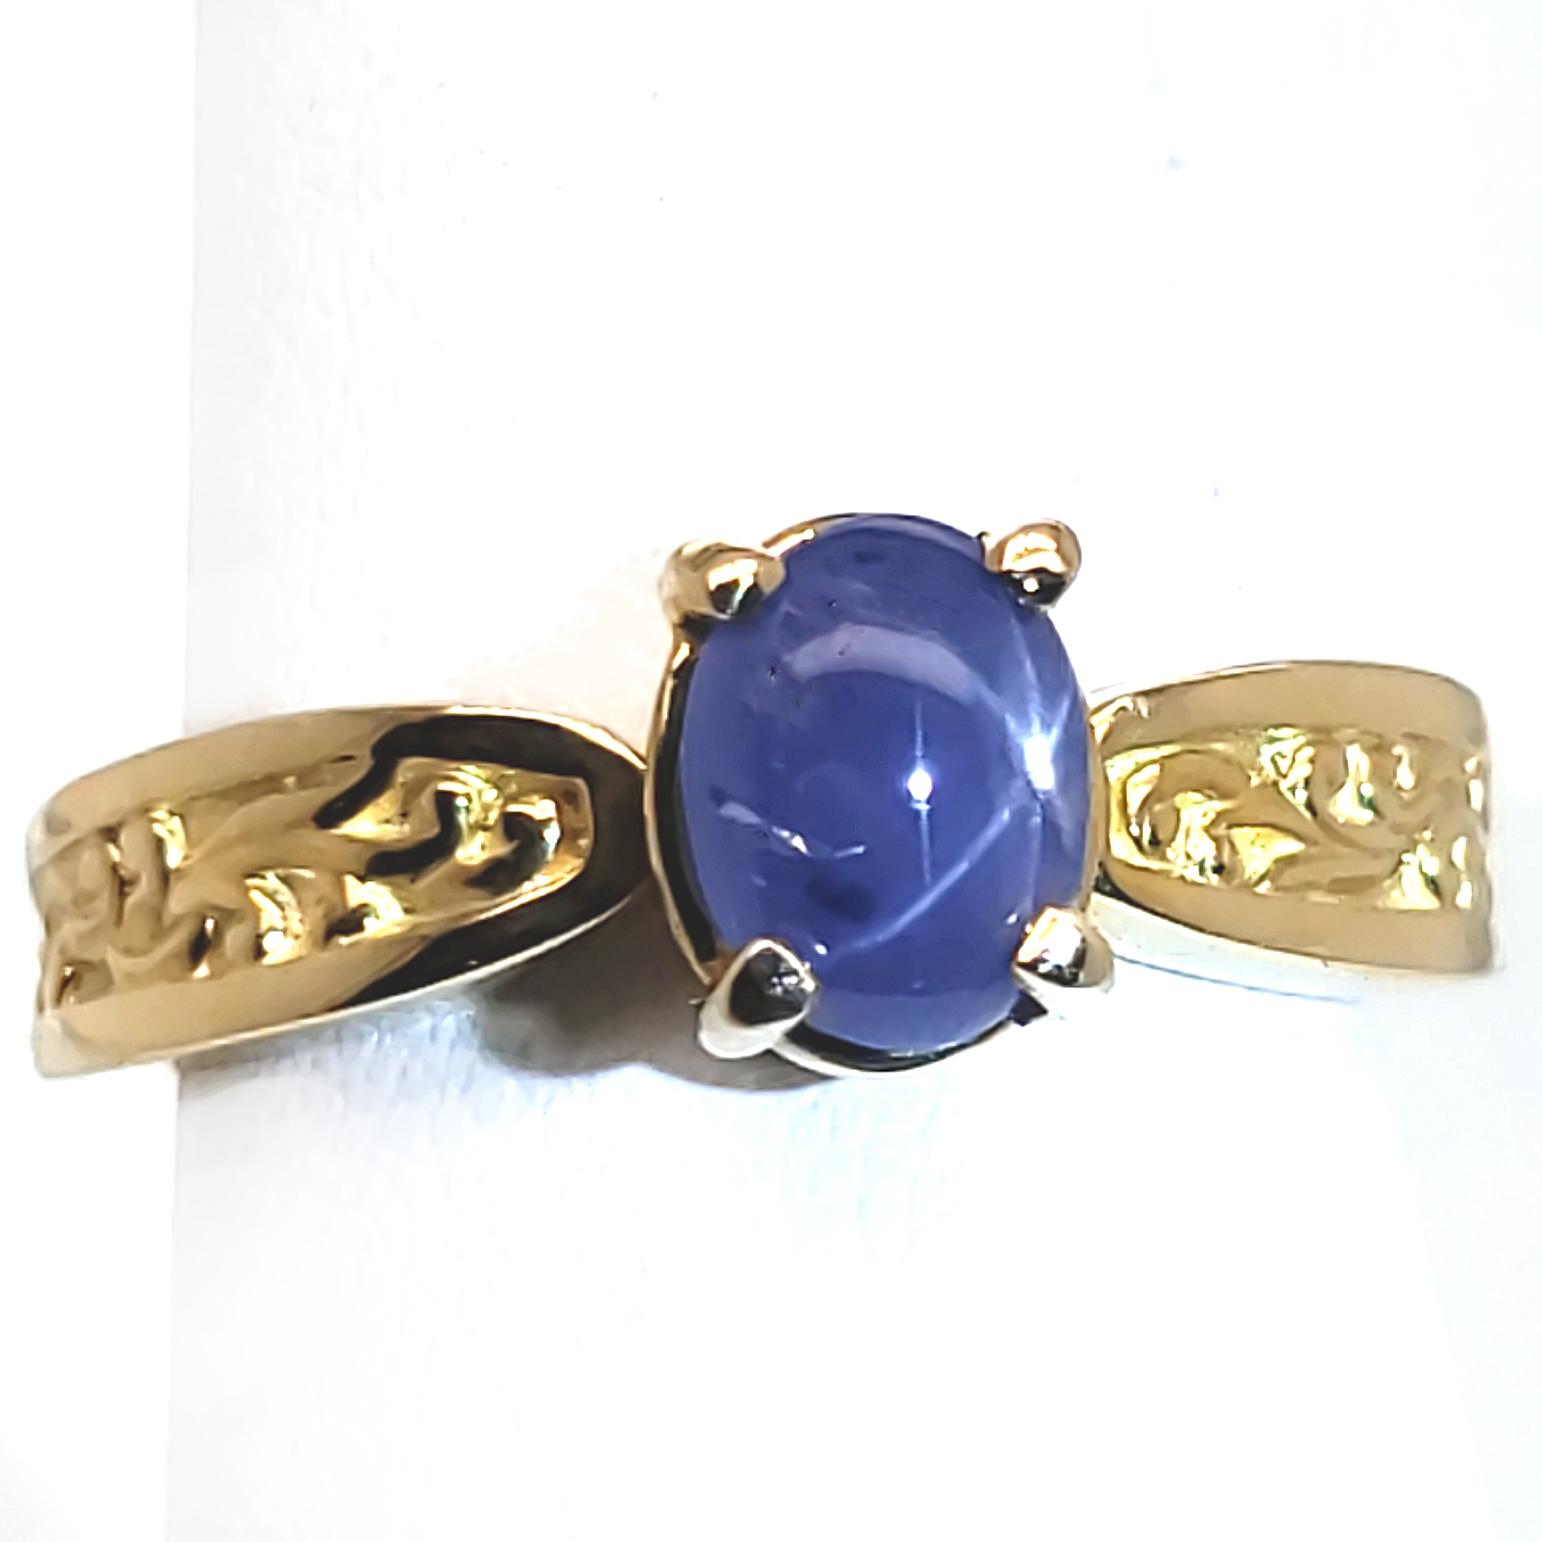 1.84 ct. Blue Star Sapphire 14k Ring